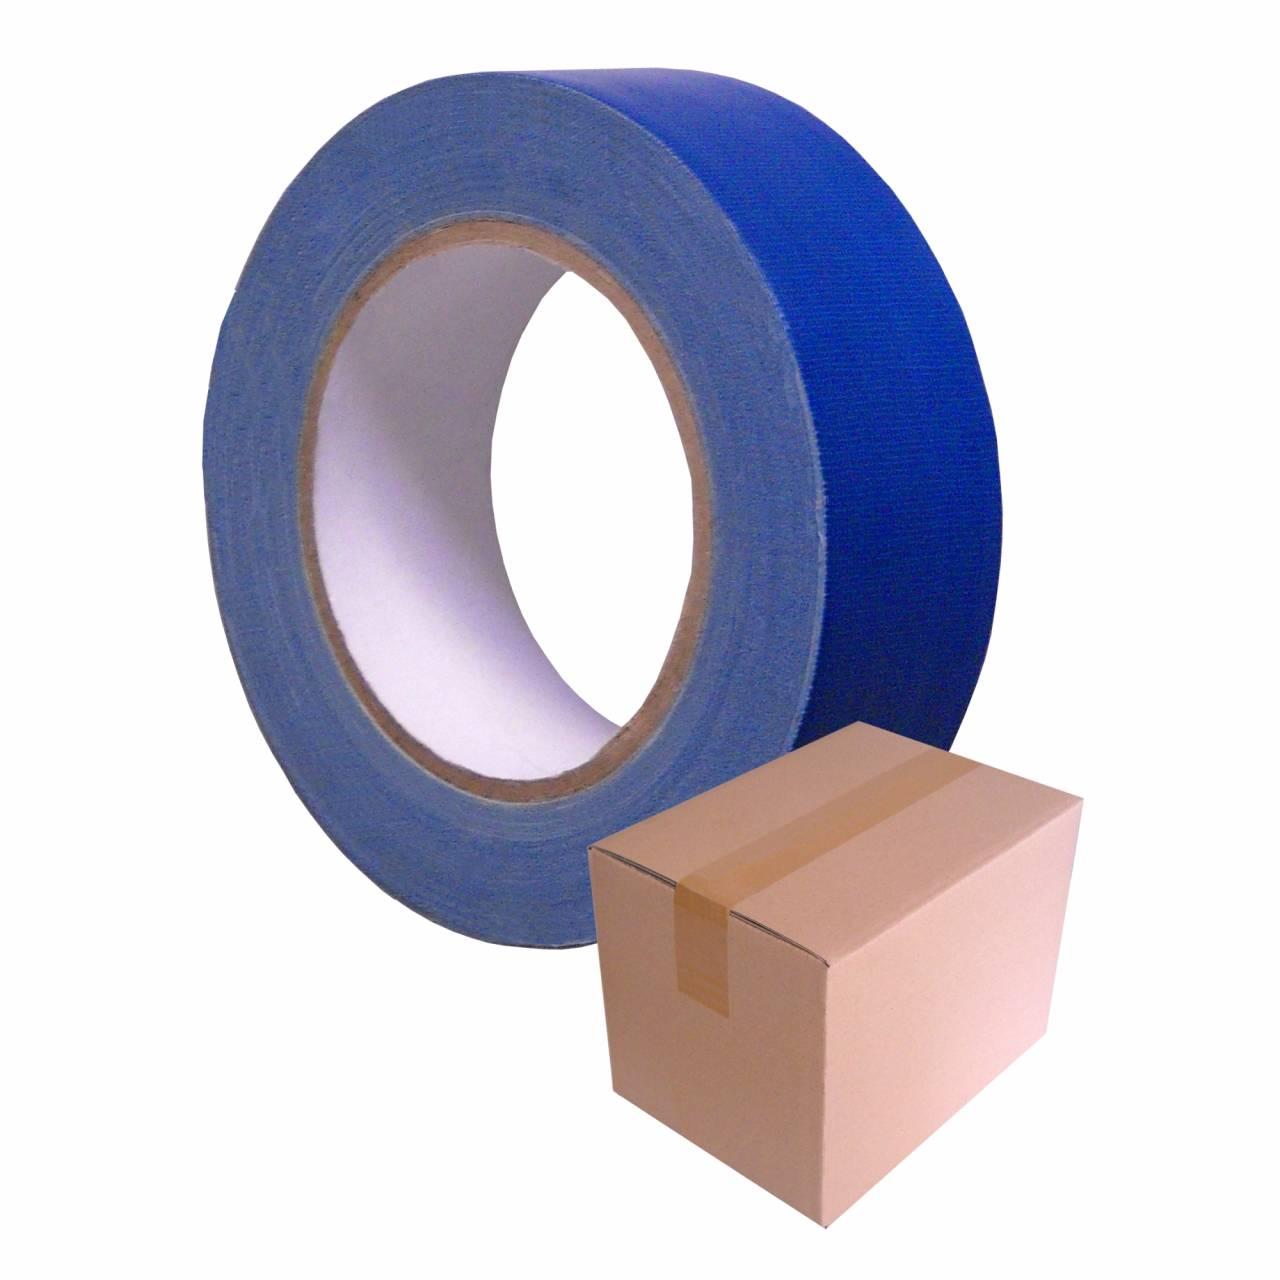 Gewebe-Klebeband T104 UV-blau, 30 mm x 25 m / Krt a 40 Rollen